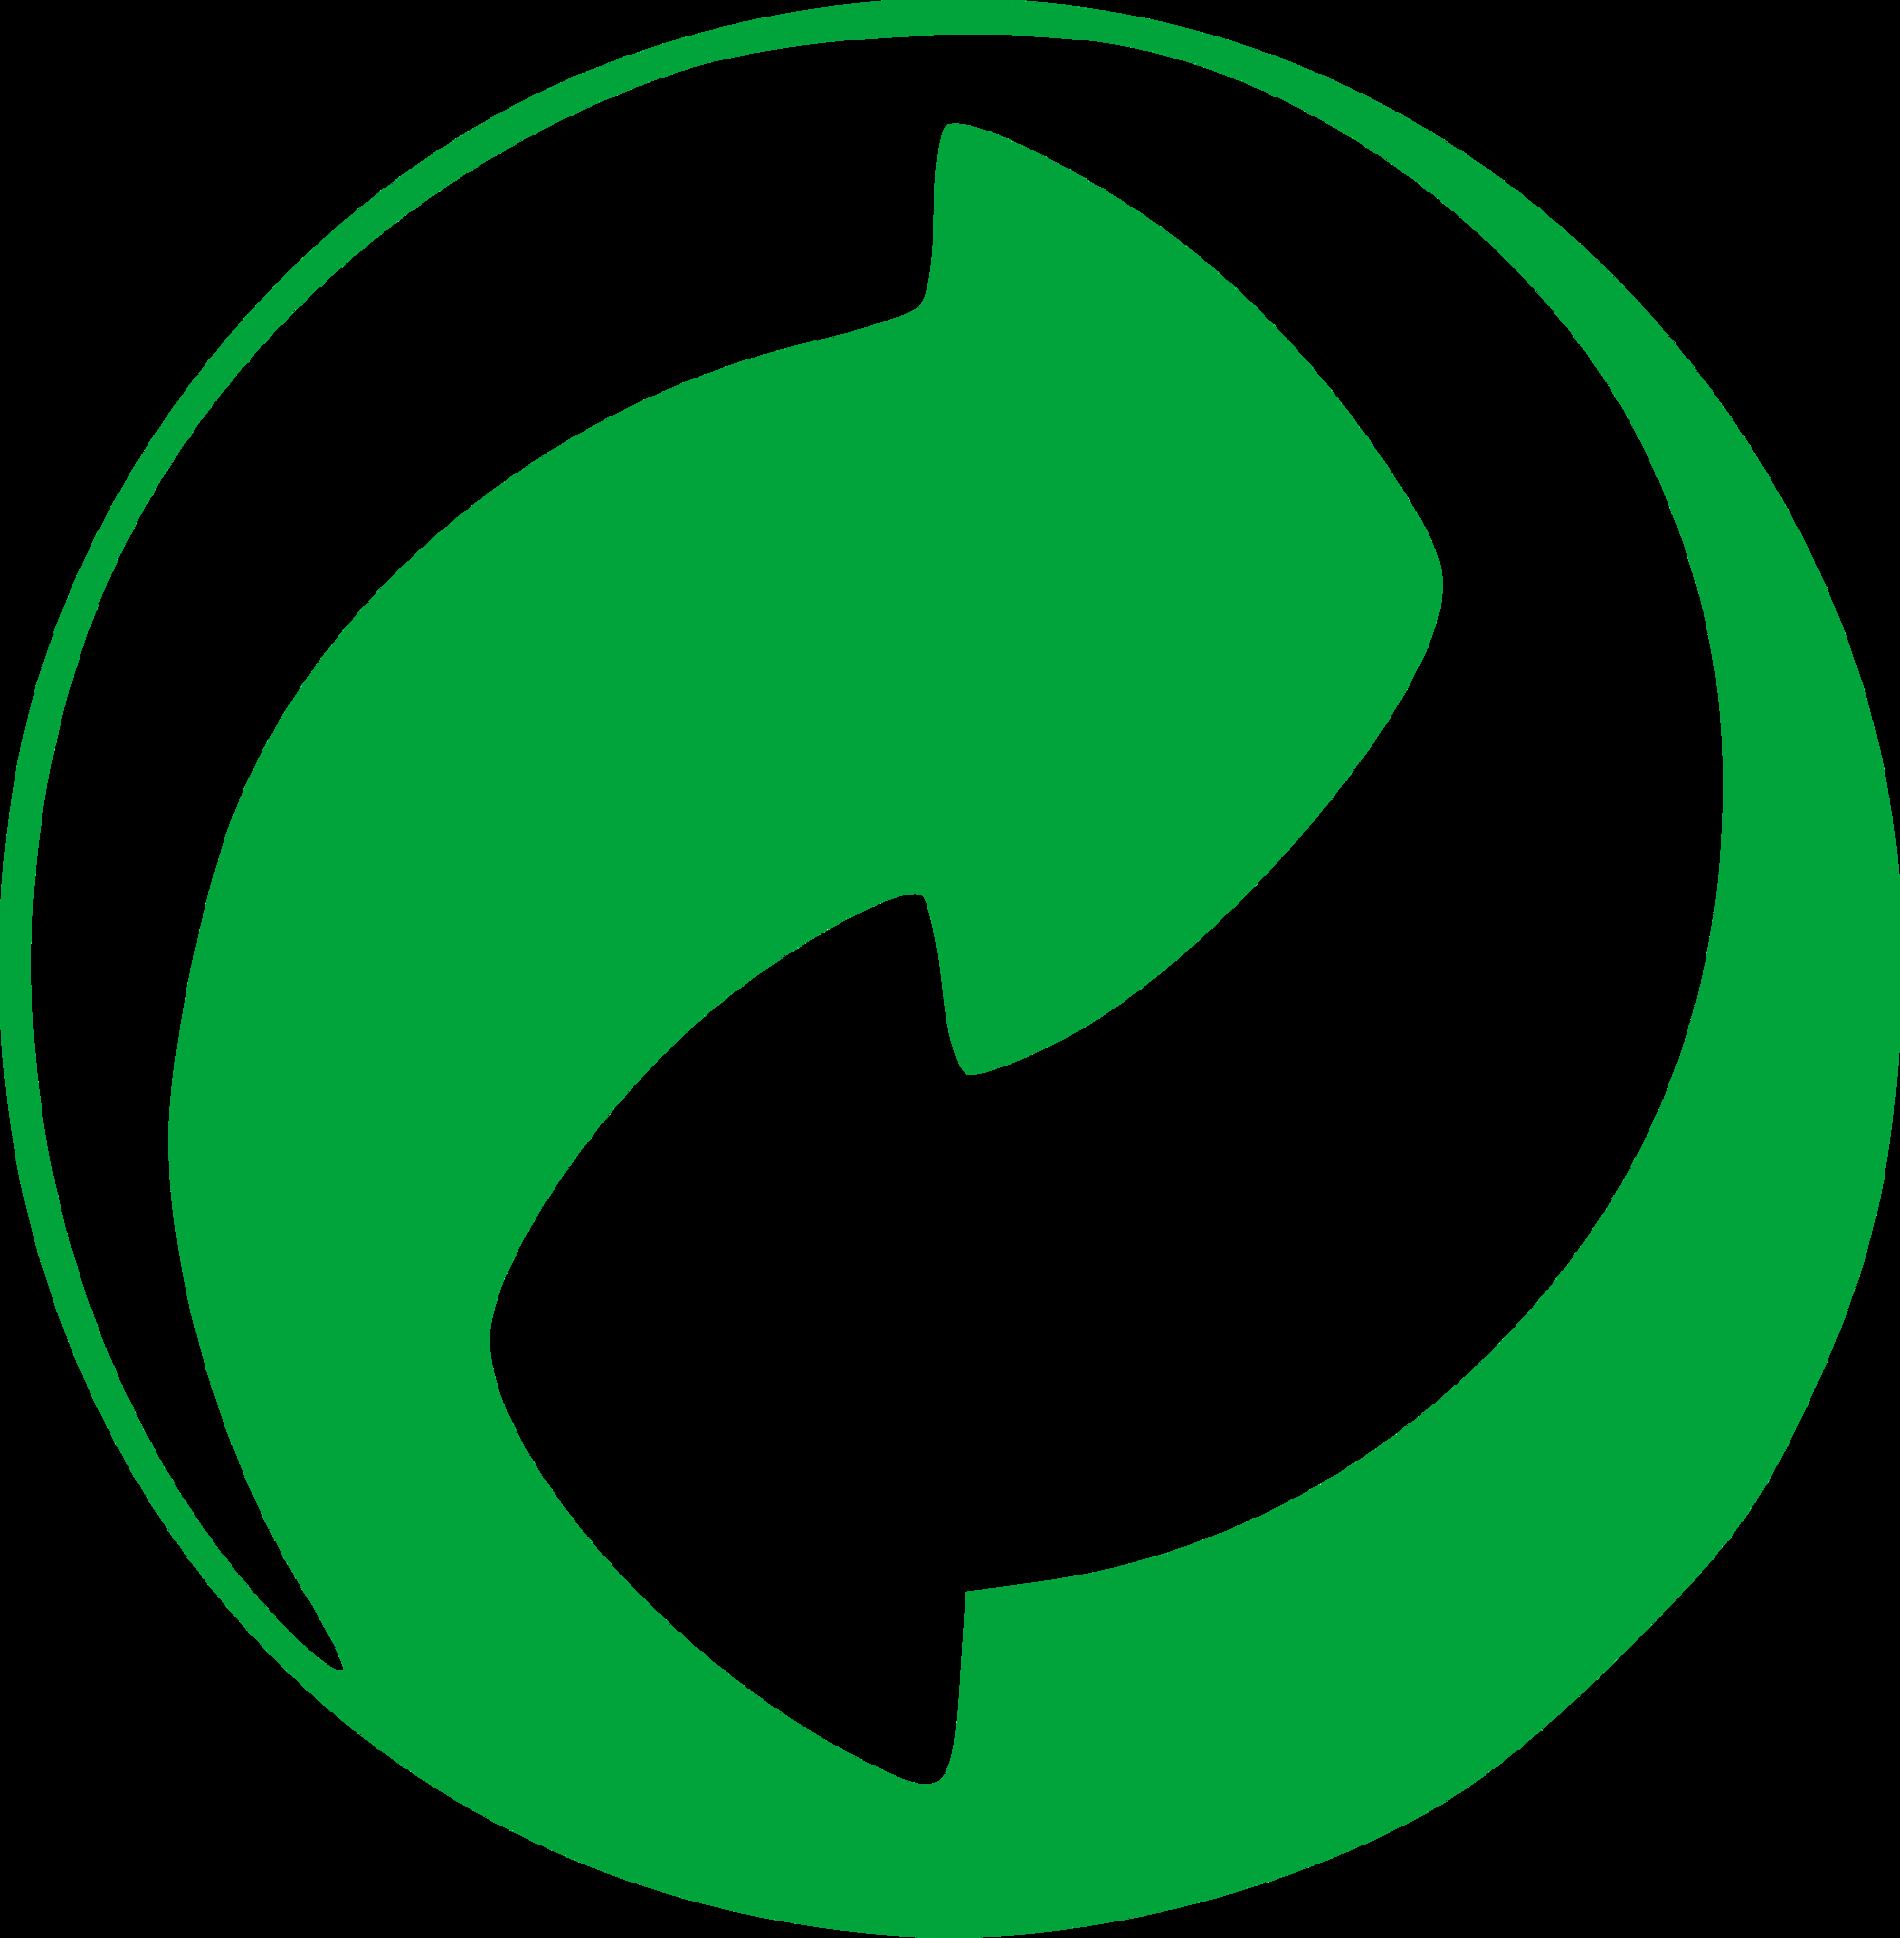 Green Dot Symbol Wikipedia The Free Encyclopedia Clipart.